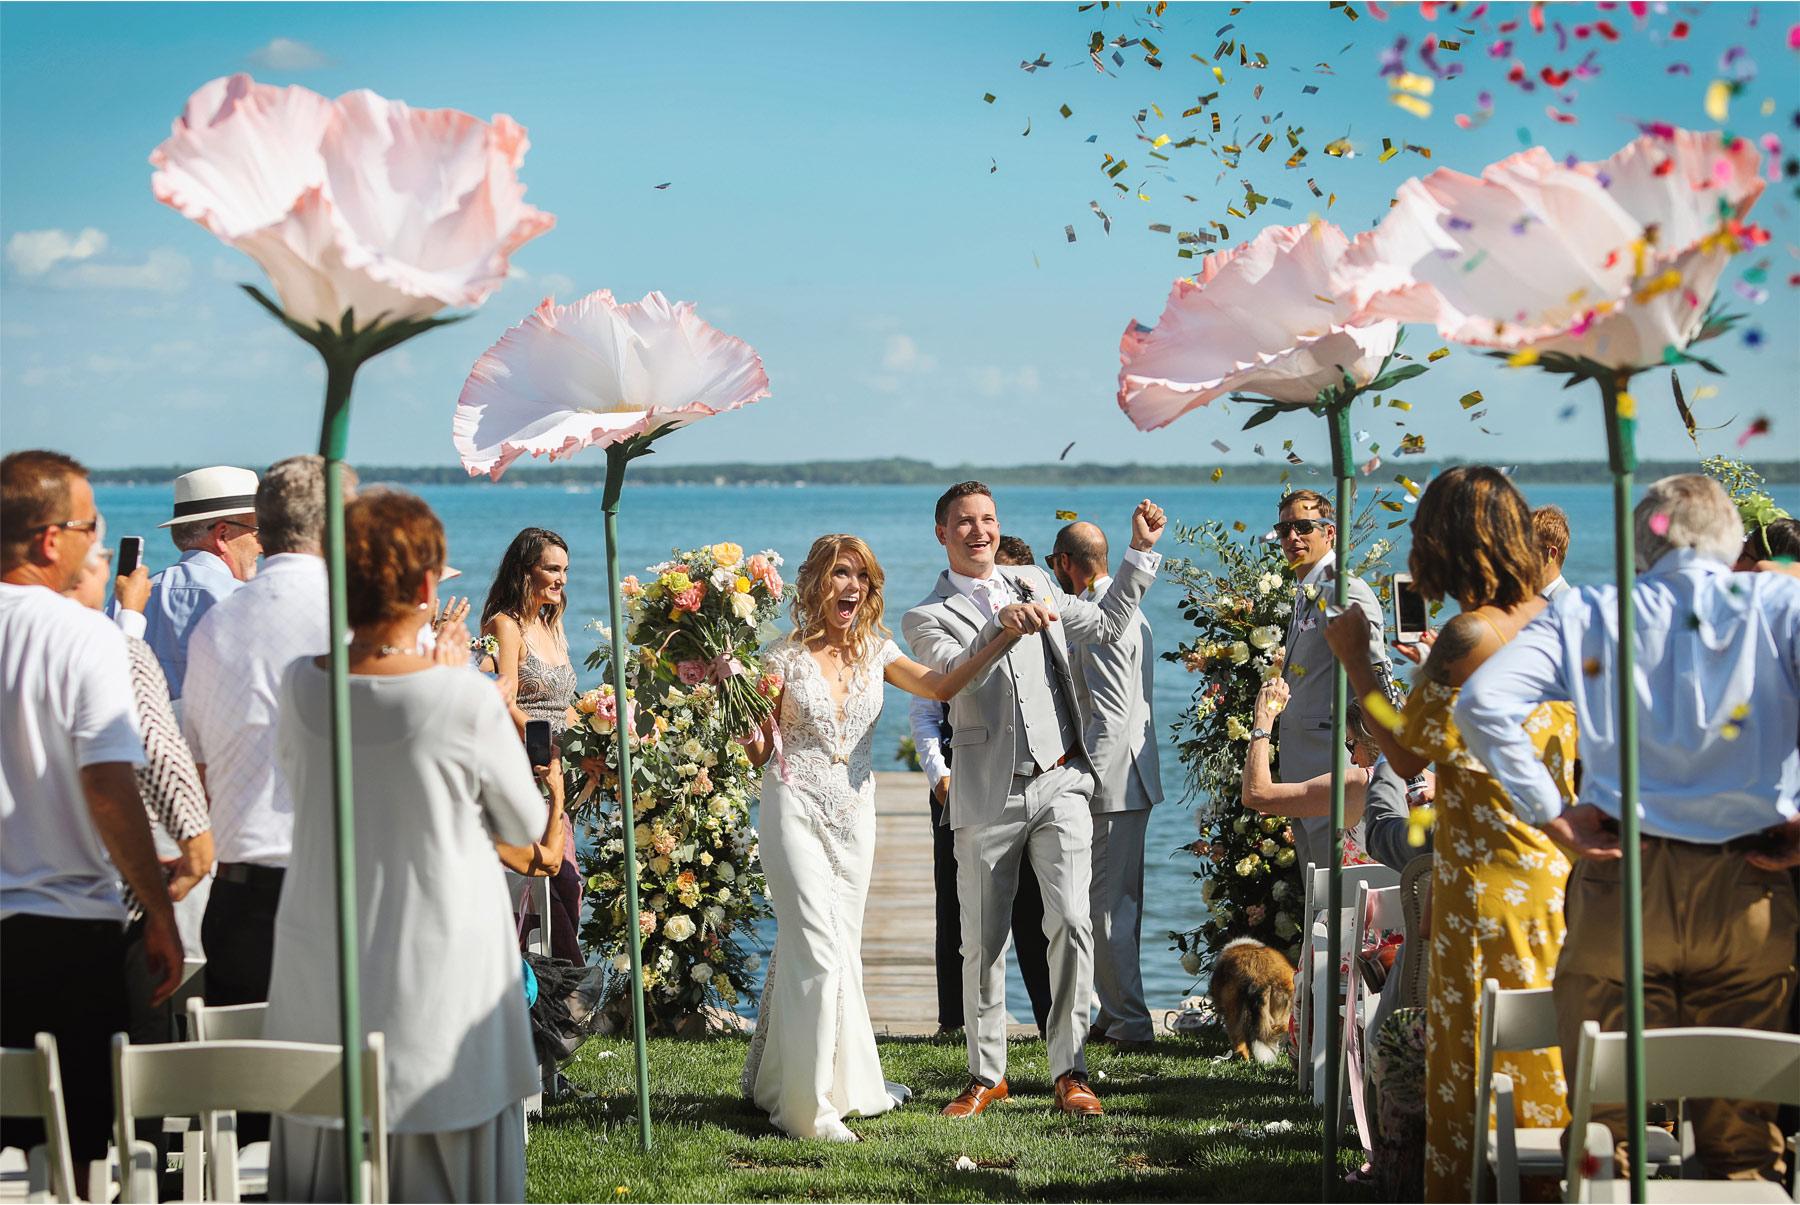 14-Vick-Photography-Wedding-Ottertail-Minnesota-Alice-in-Wonderland-Theme-Ceremony-Outdoor-Lake-Bride-Groom-Giant-Poppys-Flowers-Confetti-Tess-and-Greg.jpg